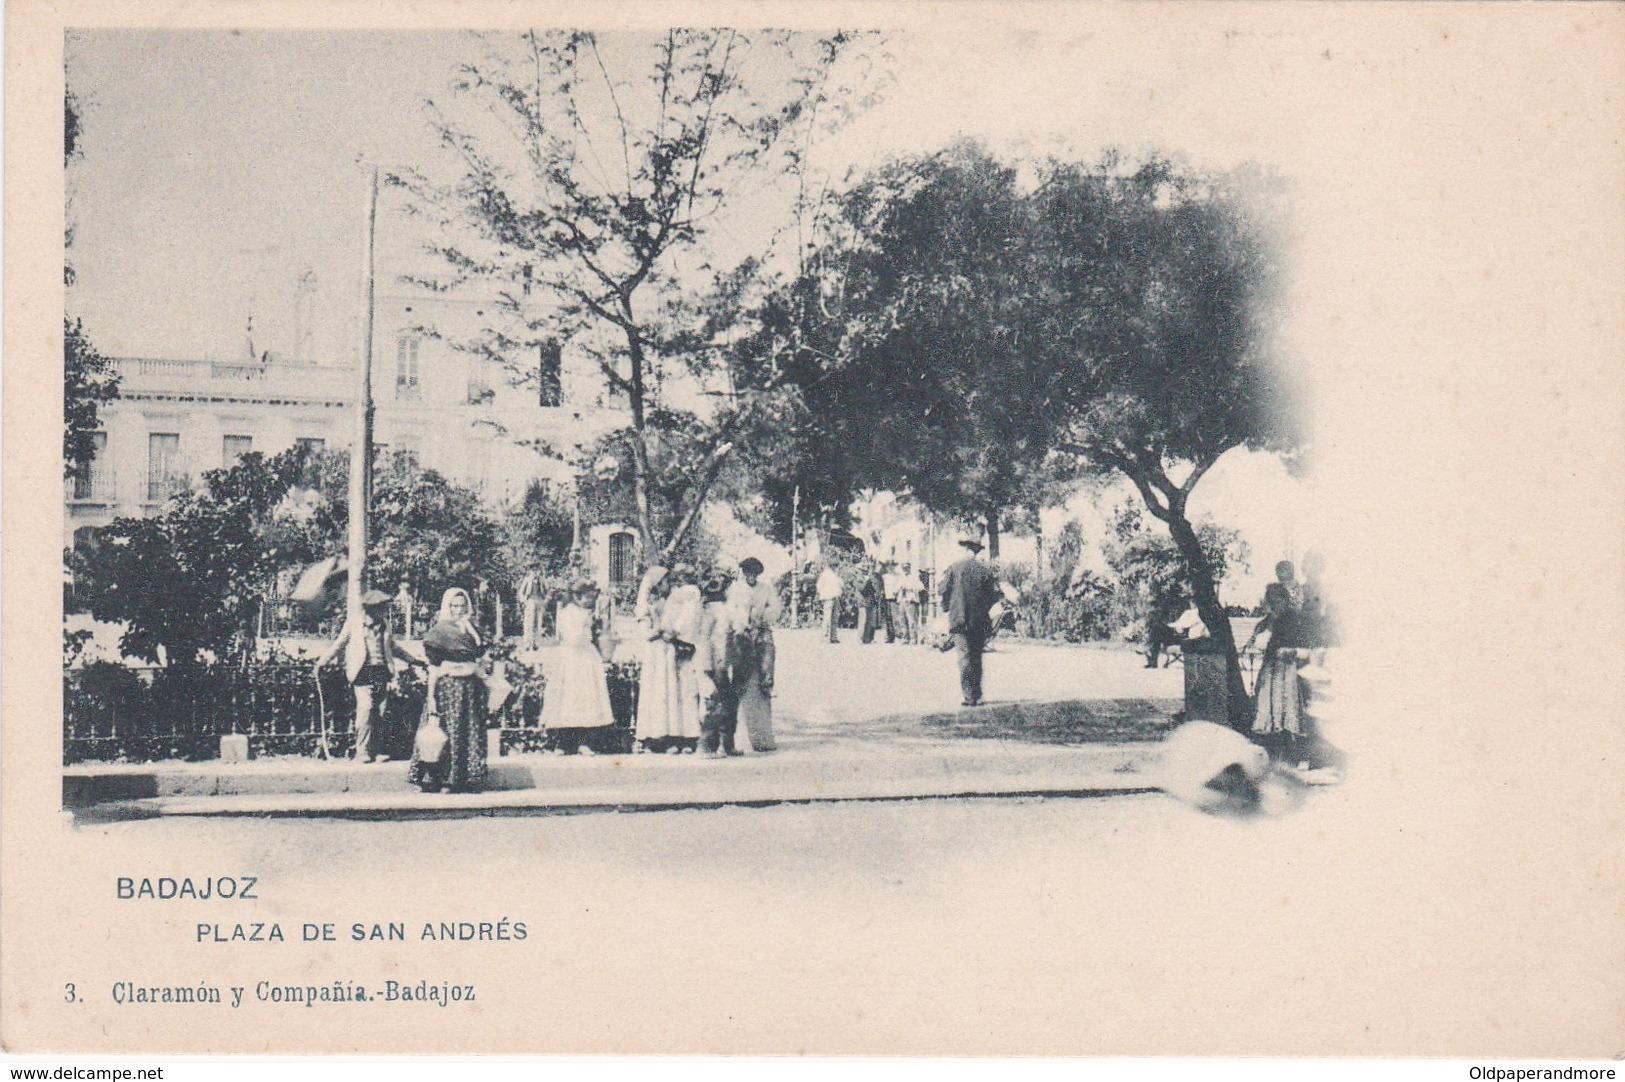 POSTCARD SPAIN ESPAÑA - BADAJOZ - PLAZA DE SAN ANDRÉS - Badajoz